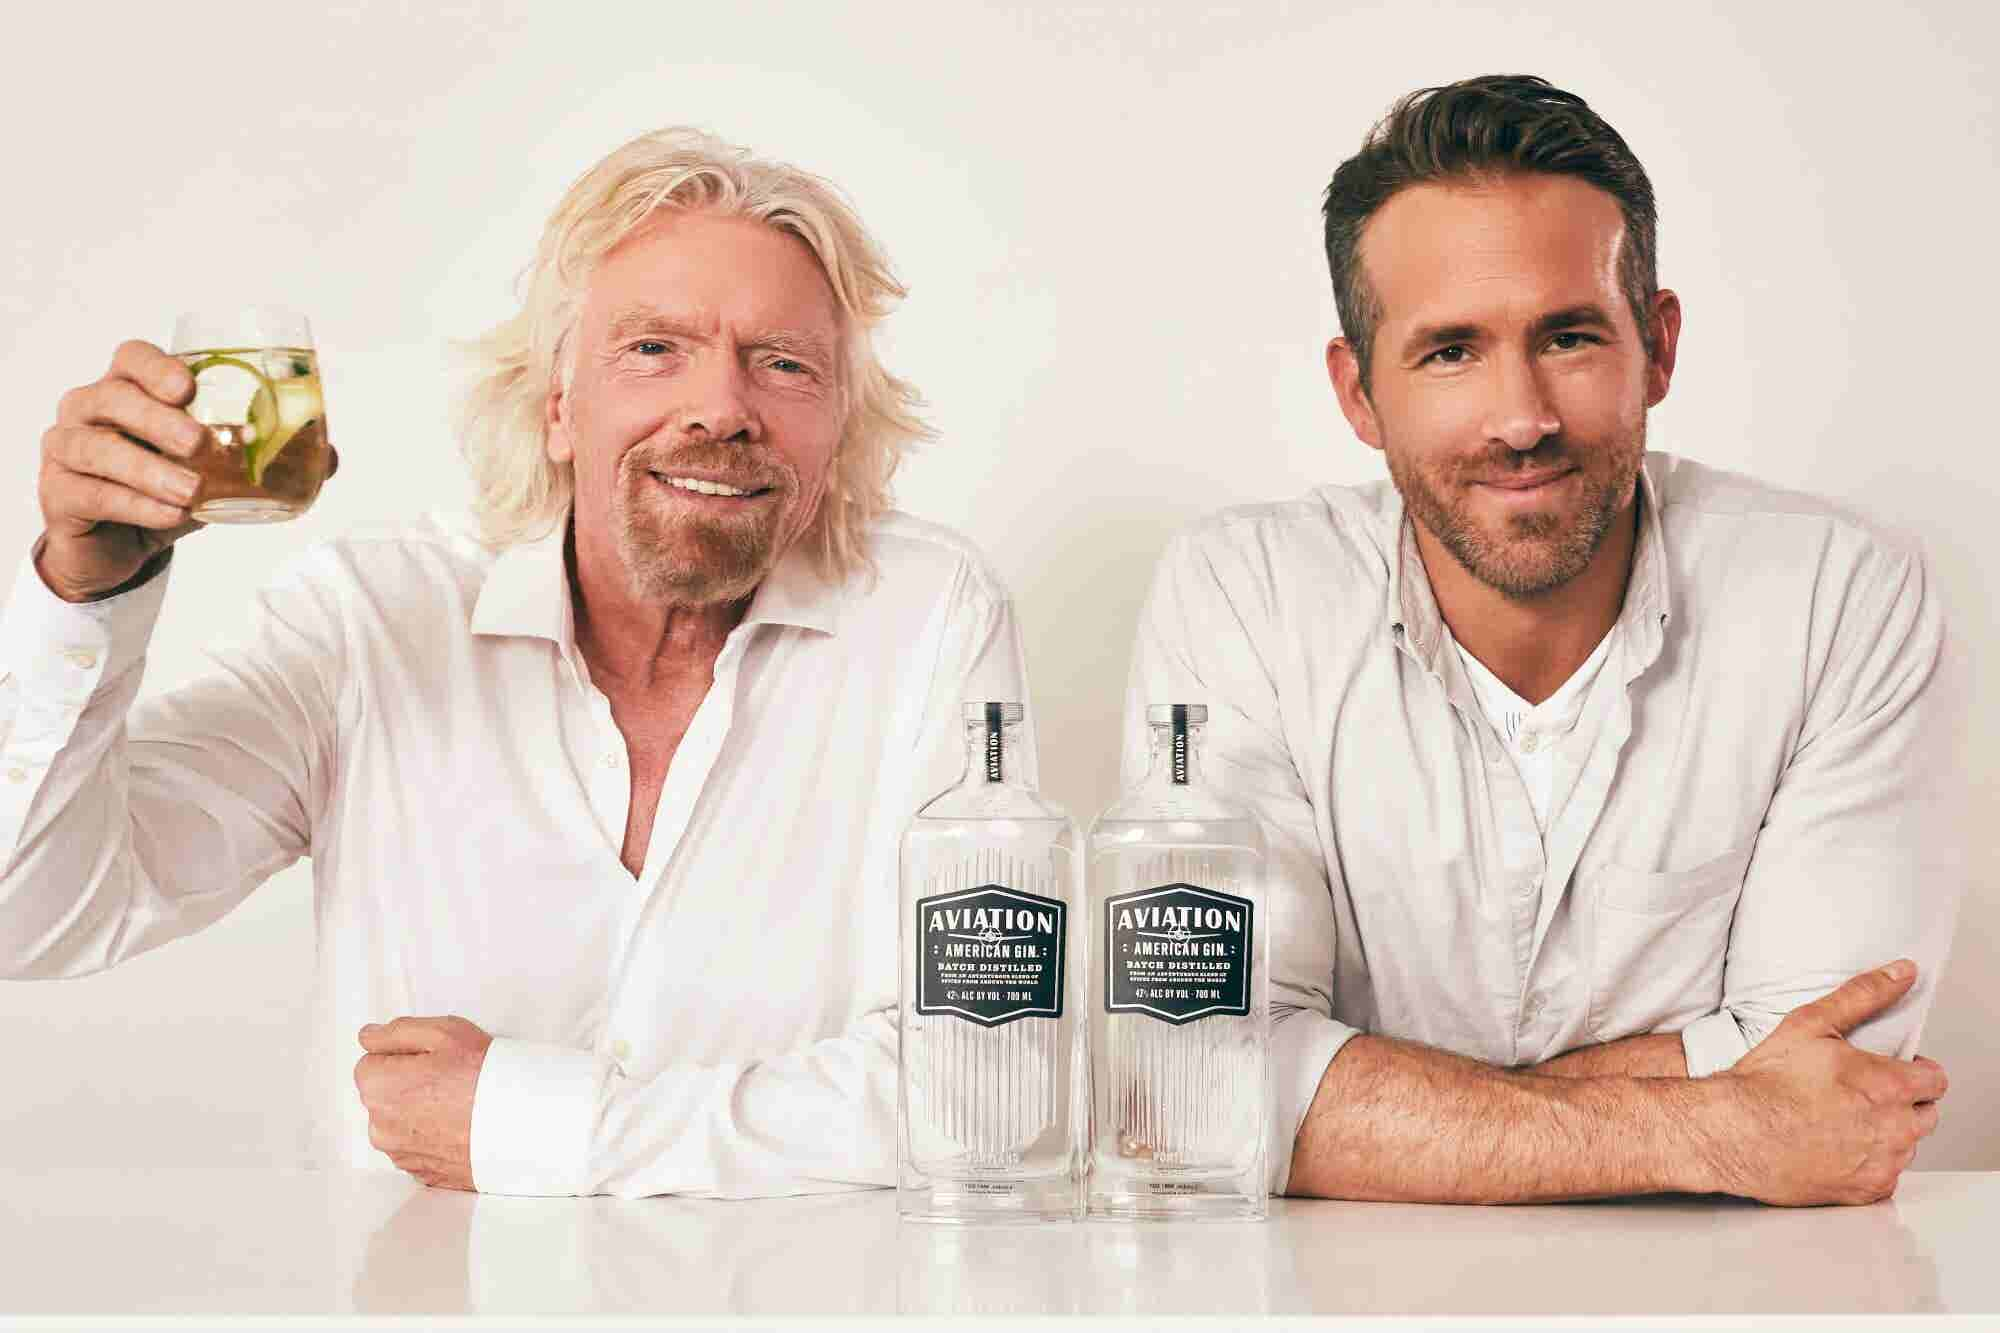 Richard Branson Skewers Ryan Reynolds's Business Knowledge as Virgin Atlantic and Aviation Gin Announce Partnership